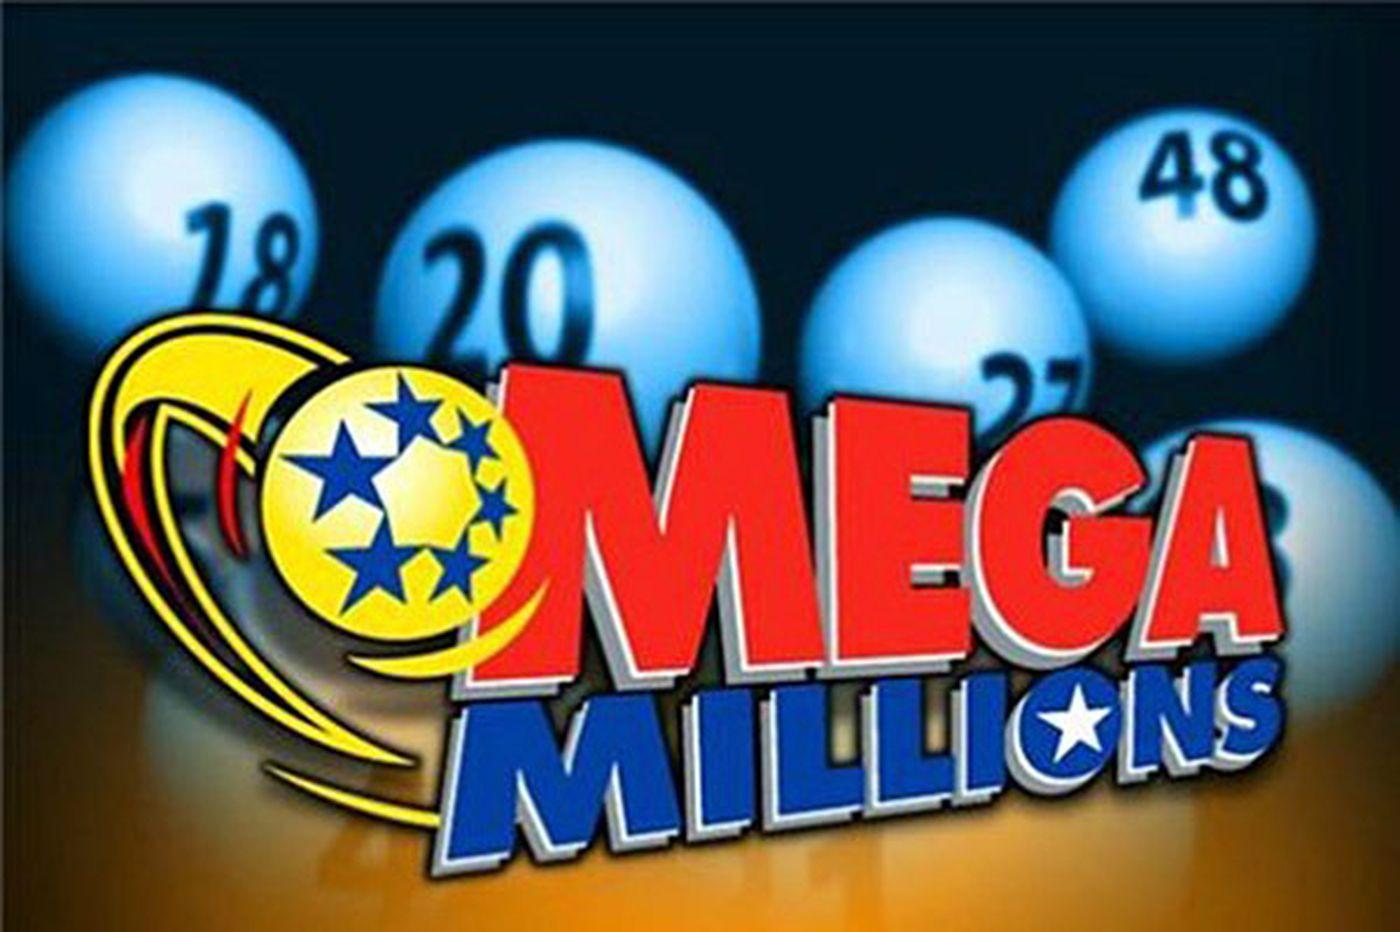 Pa Mega Millions Ticket Wins 1 Million